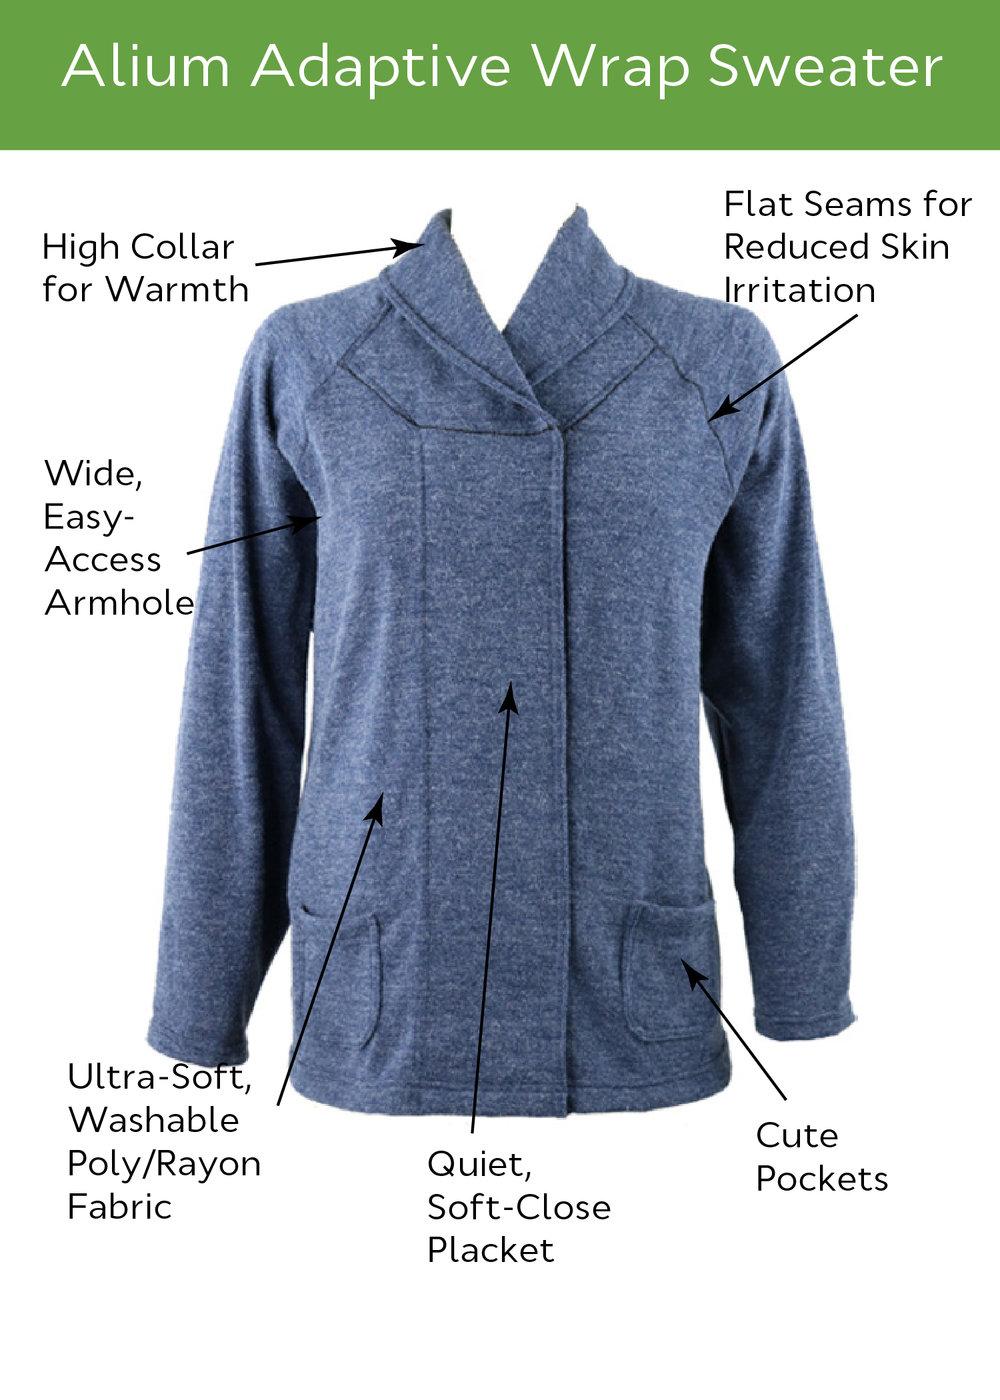 AboutSweaterJPG-01.jpg